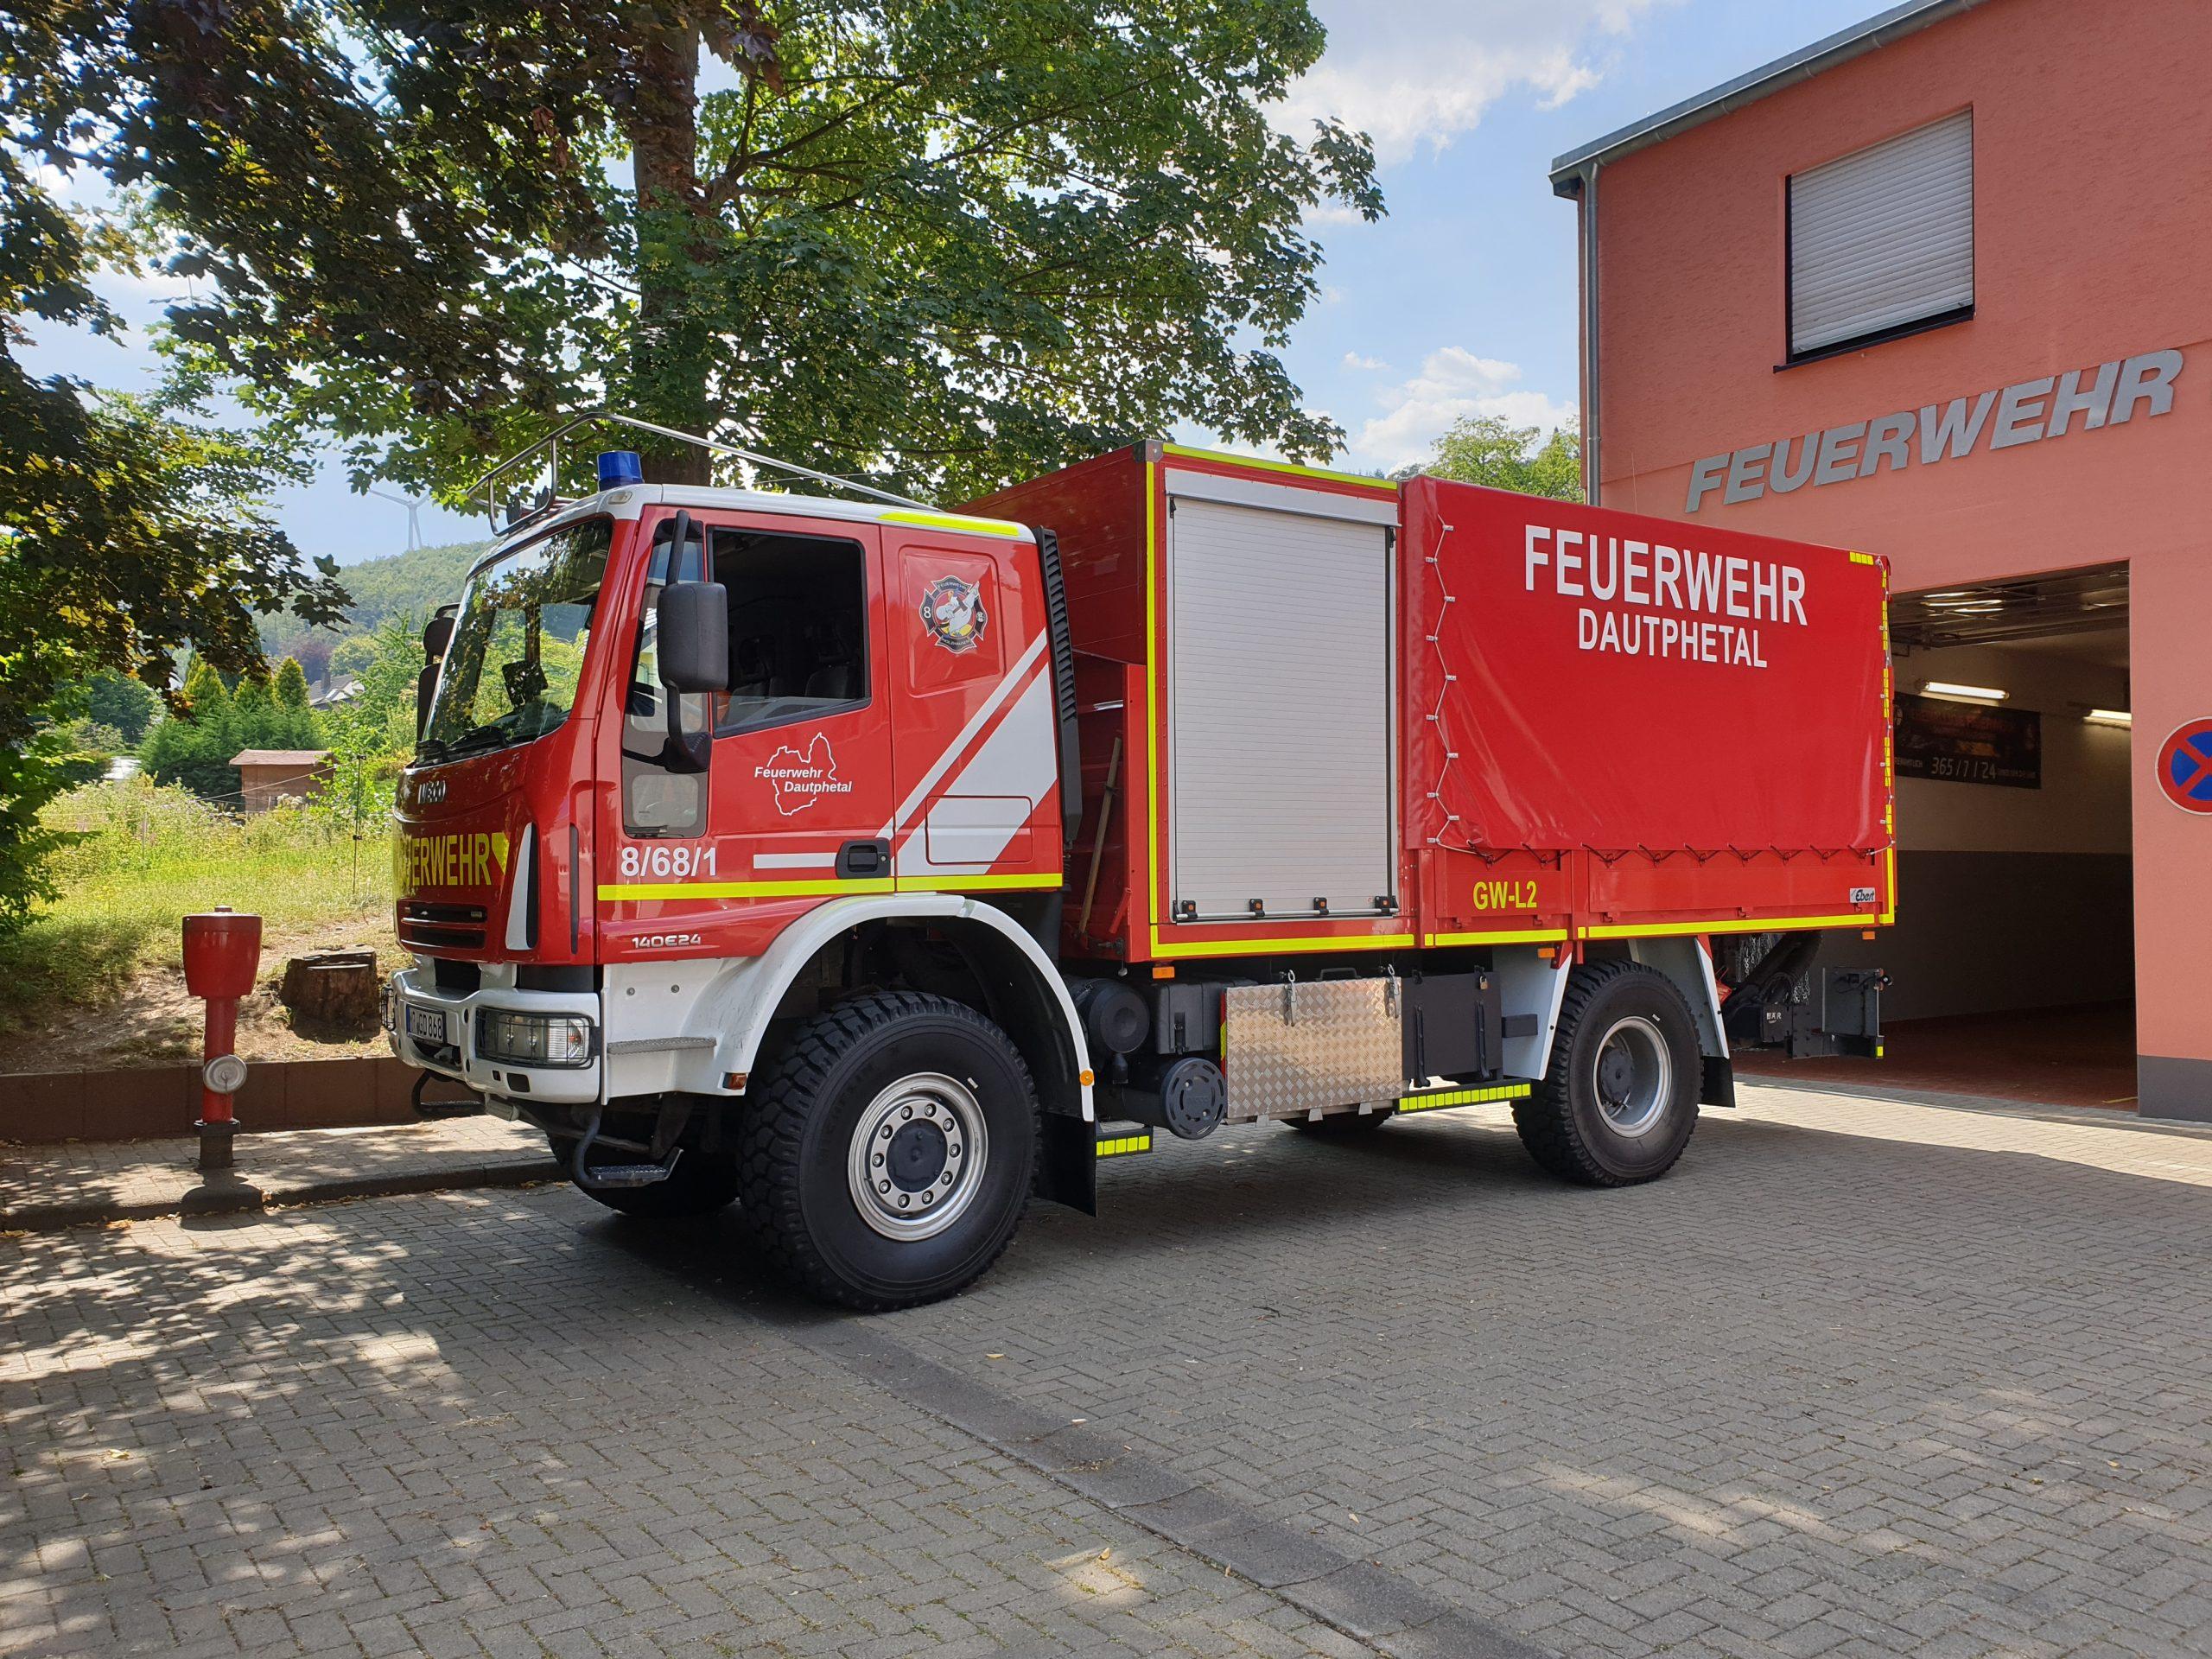 #0021 - GW-L2 FF Dautphetal, OT Holzhausen